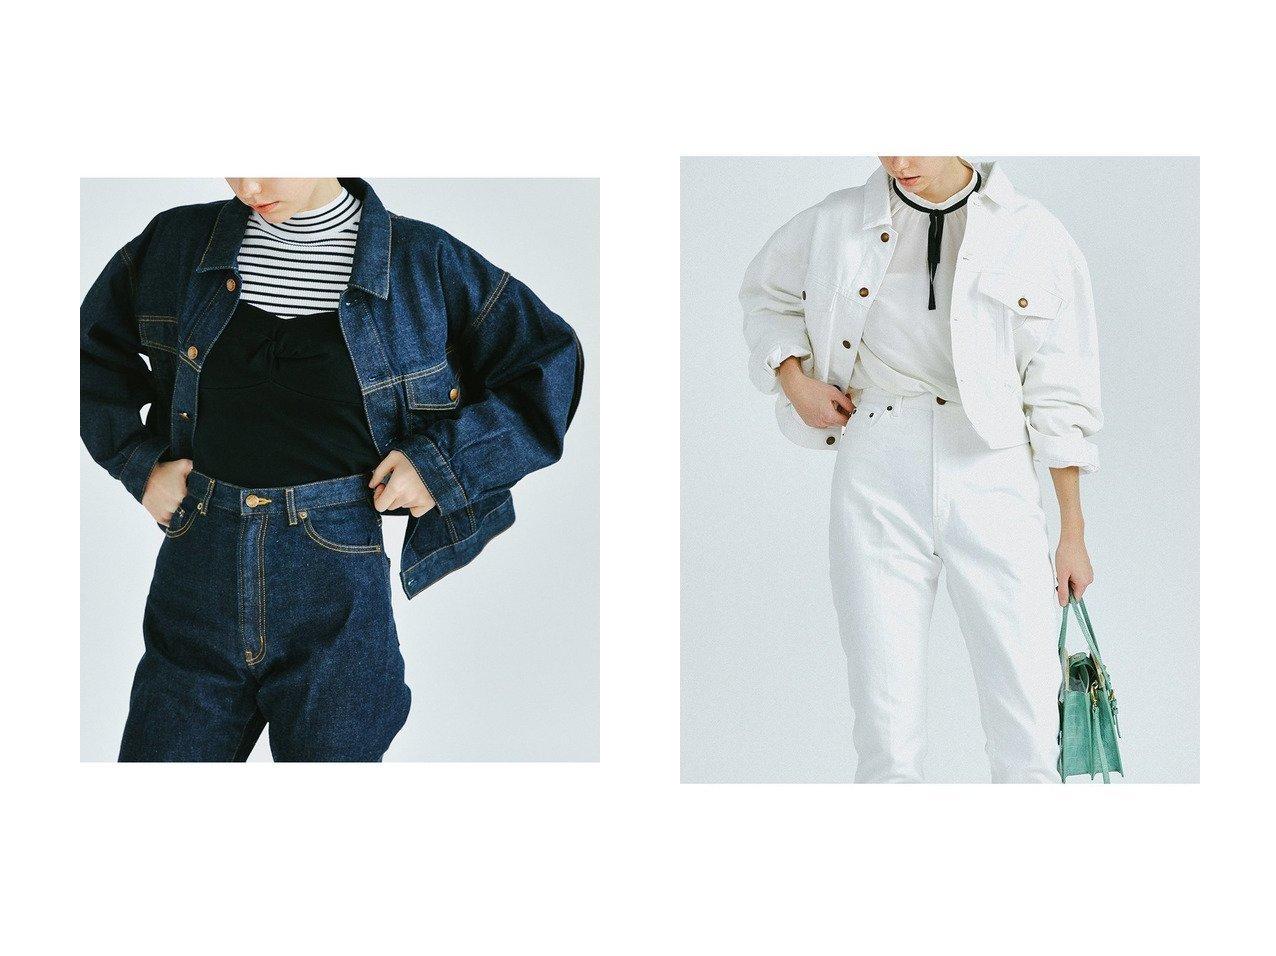 【LANVIN en Bleu/ランバン オン ブルー】のバックフリルデニムジャケット LANVIN en Bleuのおすすめ!人気、トレンド・レディースファッションの通販 おすすめで人気の流行・トレンド、ファッションの通販商品 メンズファッション・キッズファッション・インテリア・家具・レディースファッション・服の通販 founy(ファニー) https://founy.com/ ファッション Fashion レディースファッション WOMEN アウター Coat Outerwear ジャケット Jackets デニムジャケット Denim Jackets 2021年 2021 2021 春夏 S/S SS Spring/Summer 2021 S/S 春夏 SS Spring/Summer ショート ジャケット セットアップ デニム フリル 春 Spring |ID:crp329100000019531